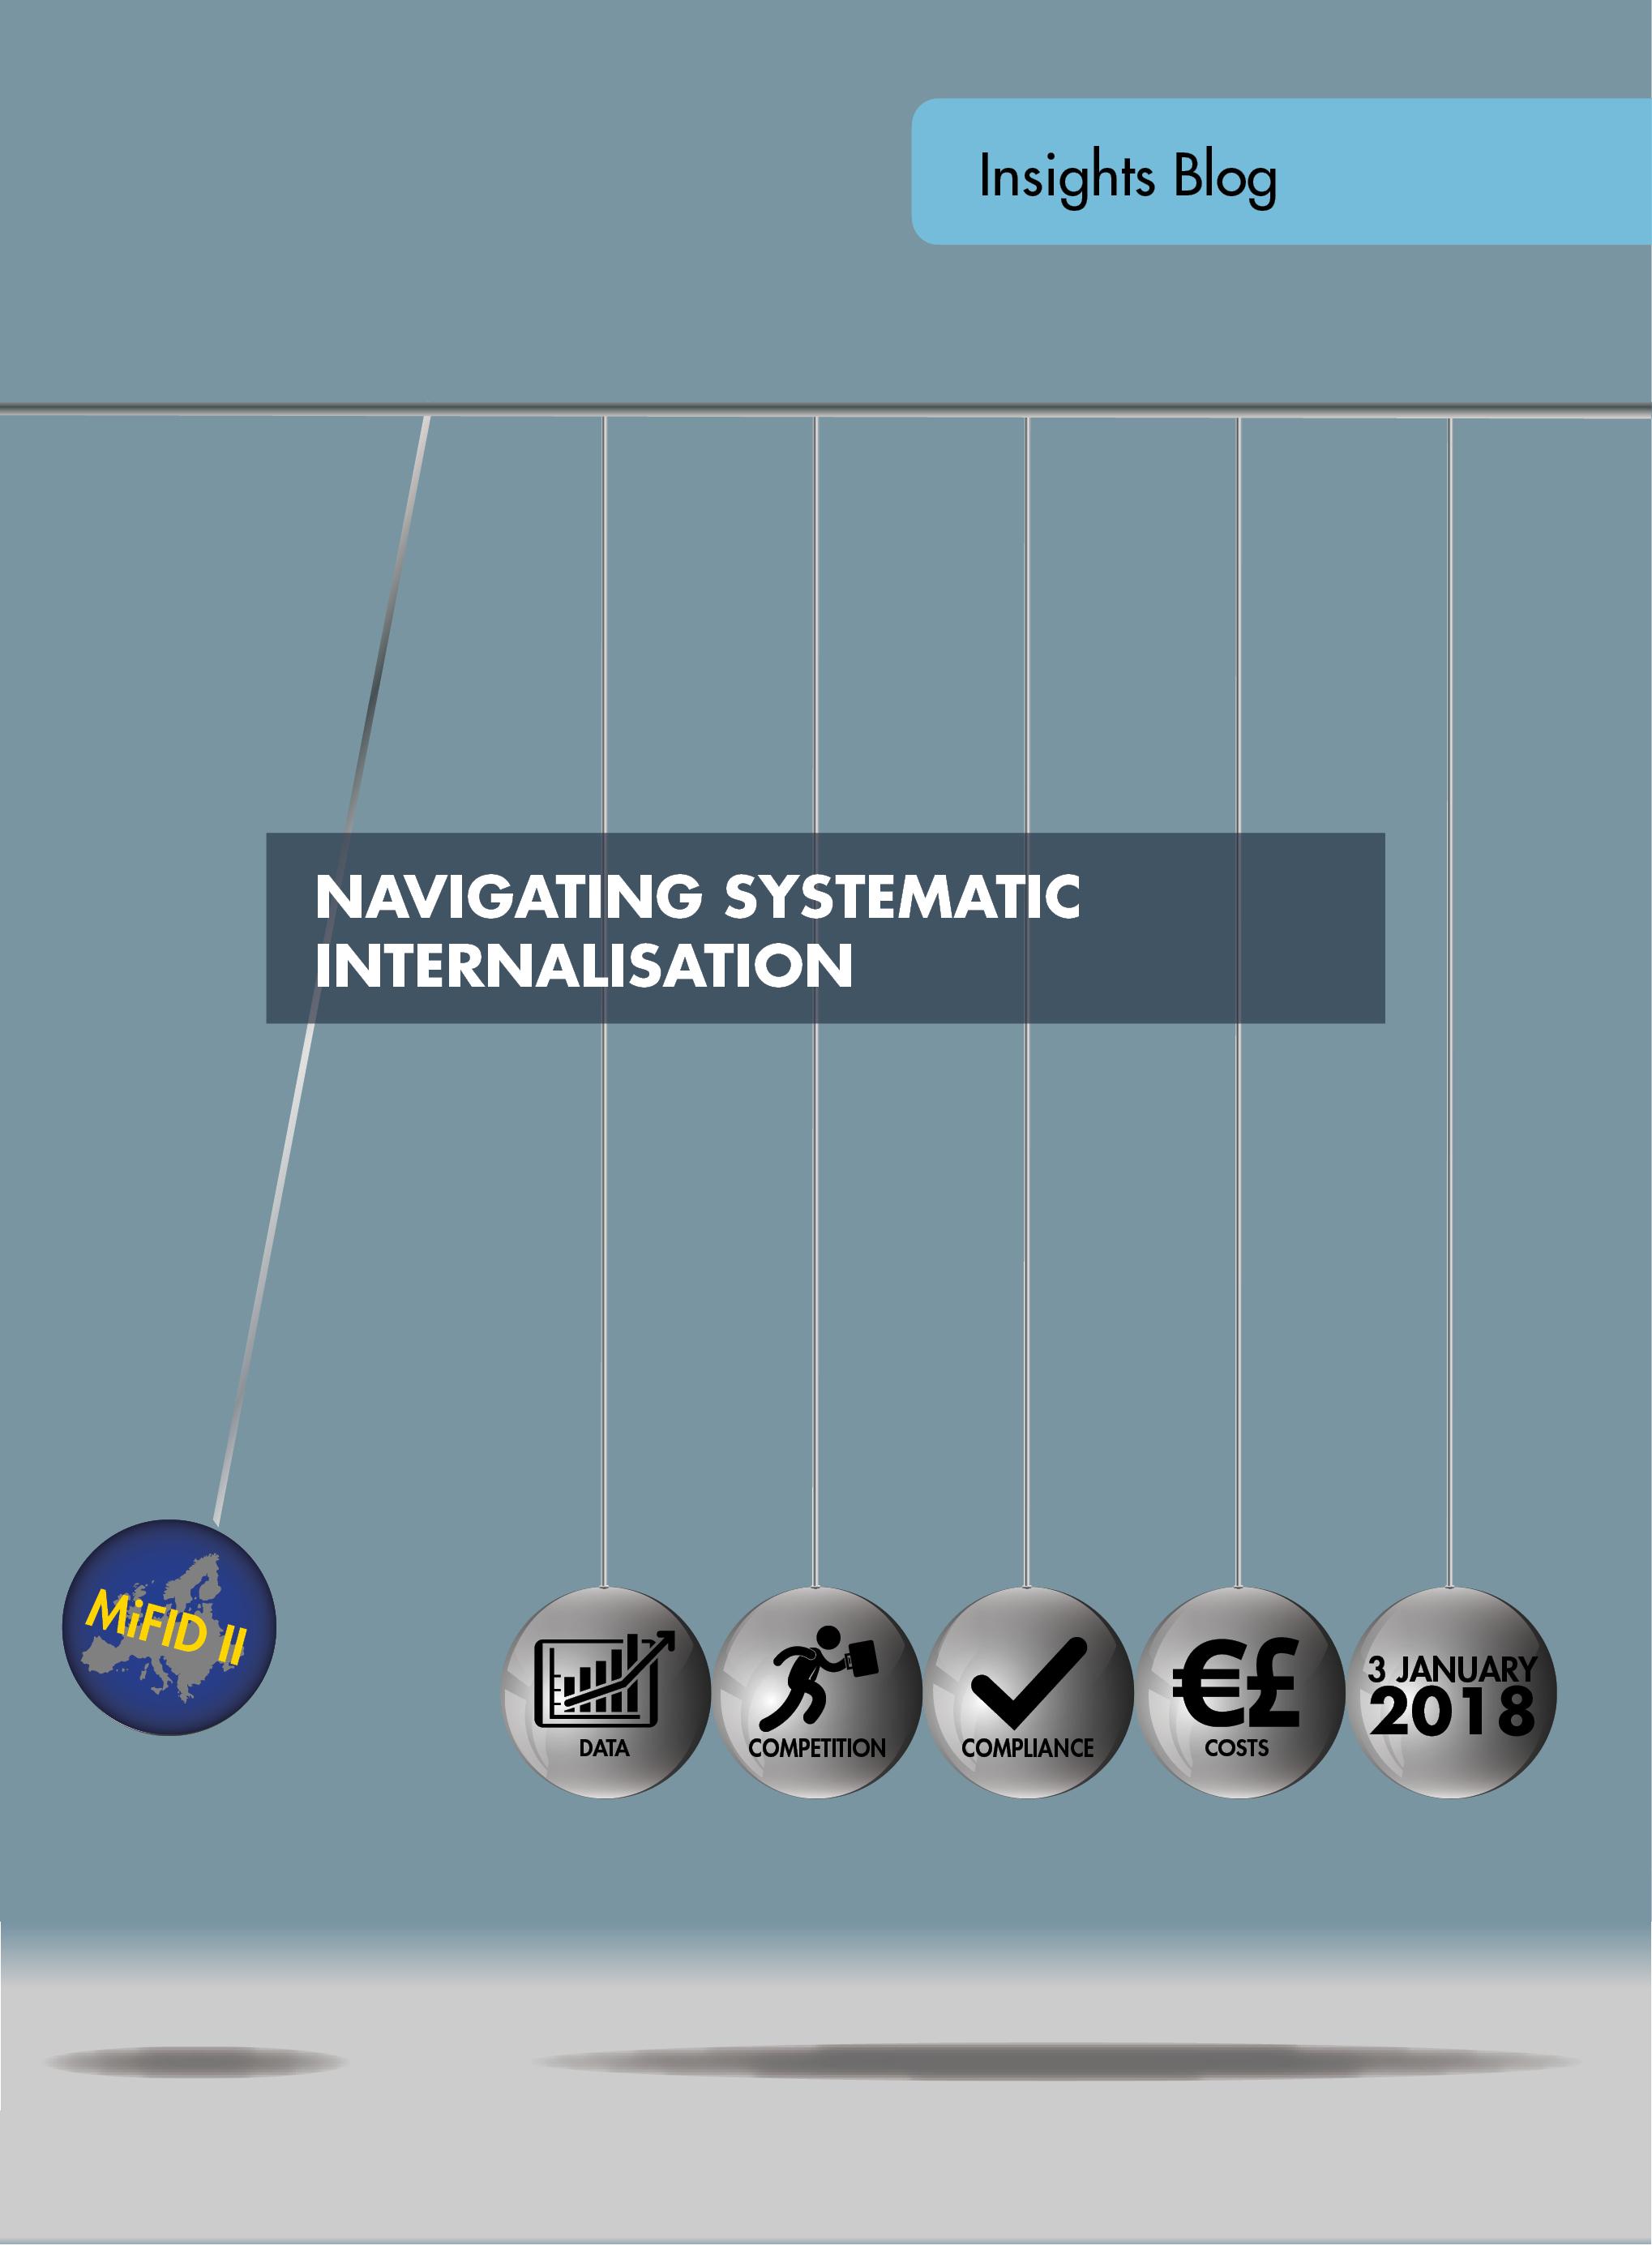 Navigating Systematic Internalisation